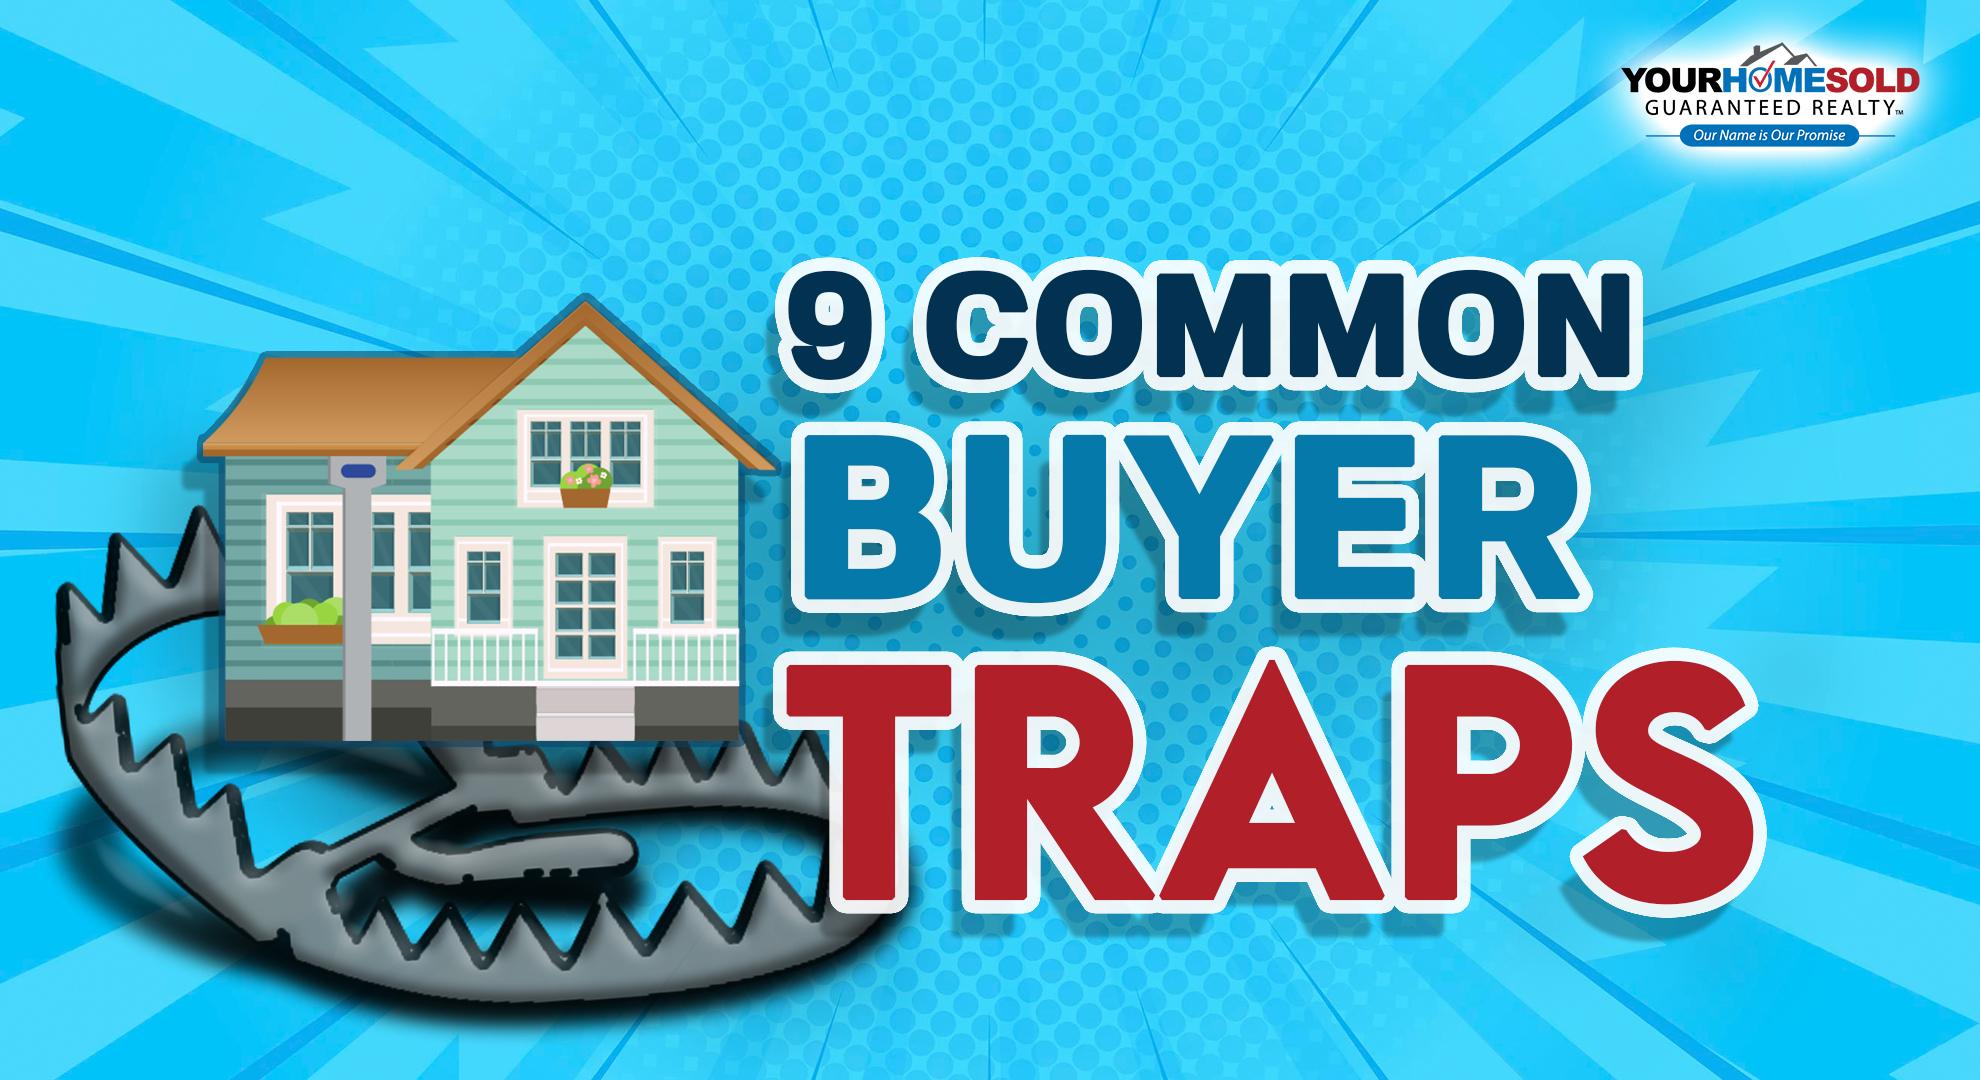 buyers trap.jpg